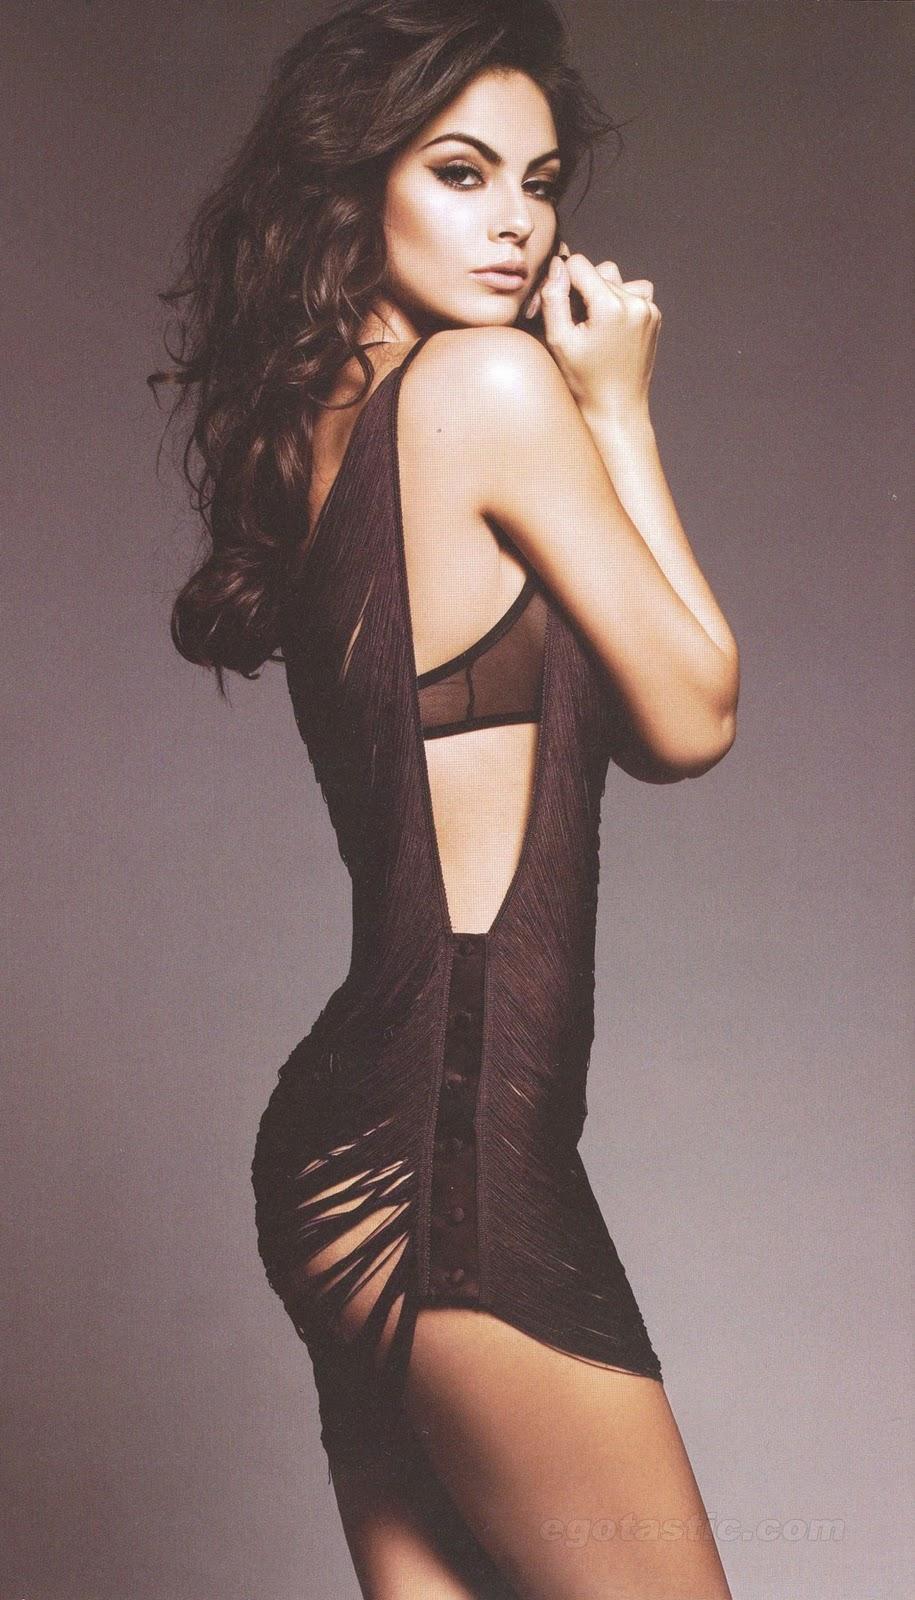 Sexy Women In The Universe: Miss Universe 2010 : Ximena Navarrete